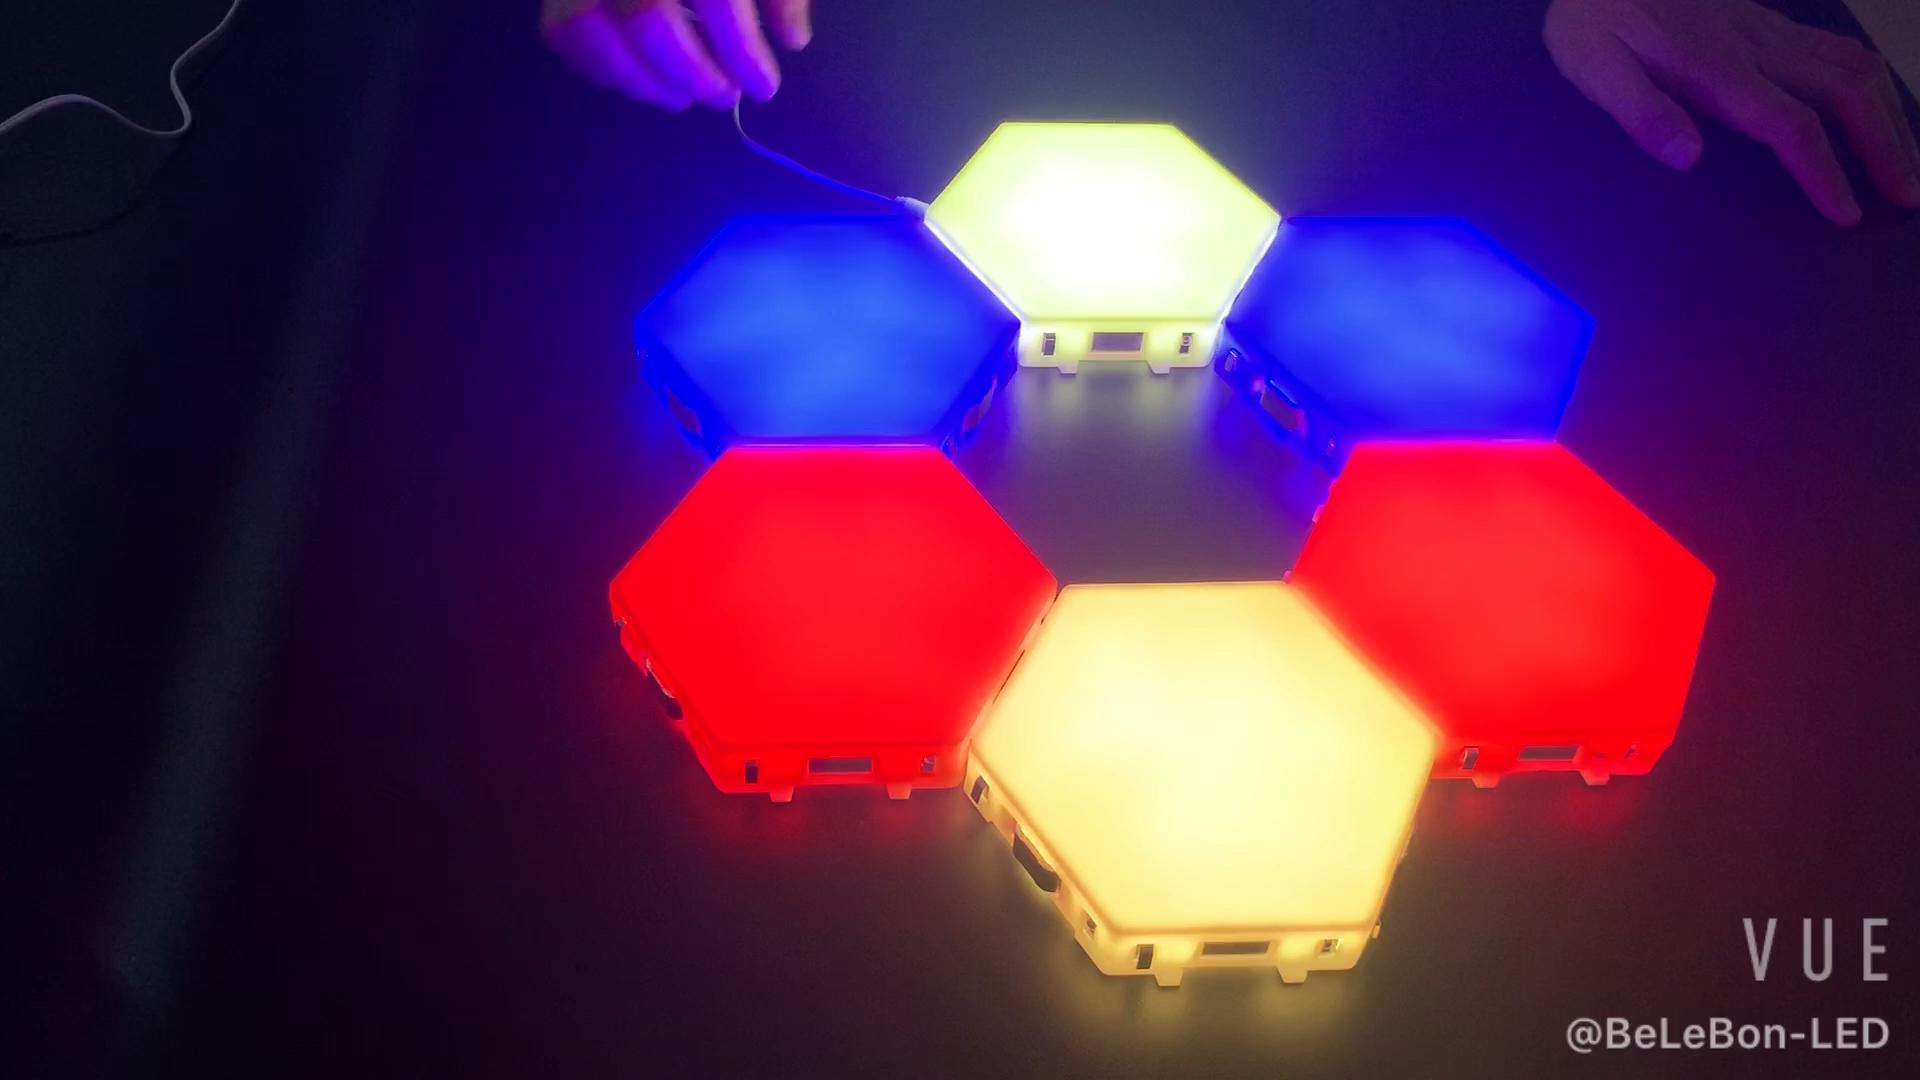 6 unids/set 3000K 4000K 6000K blanco RGB de panal LED cuántico magnético luz táctil noche lámpara Modular hexagonal lámpara de pared de luz